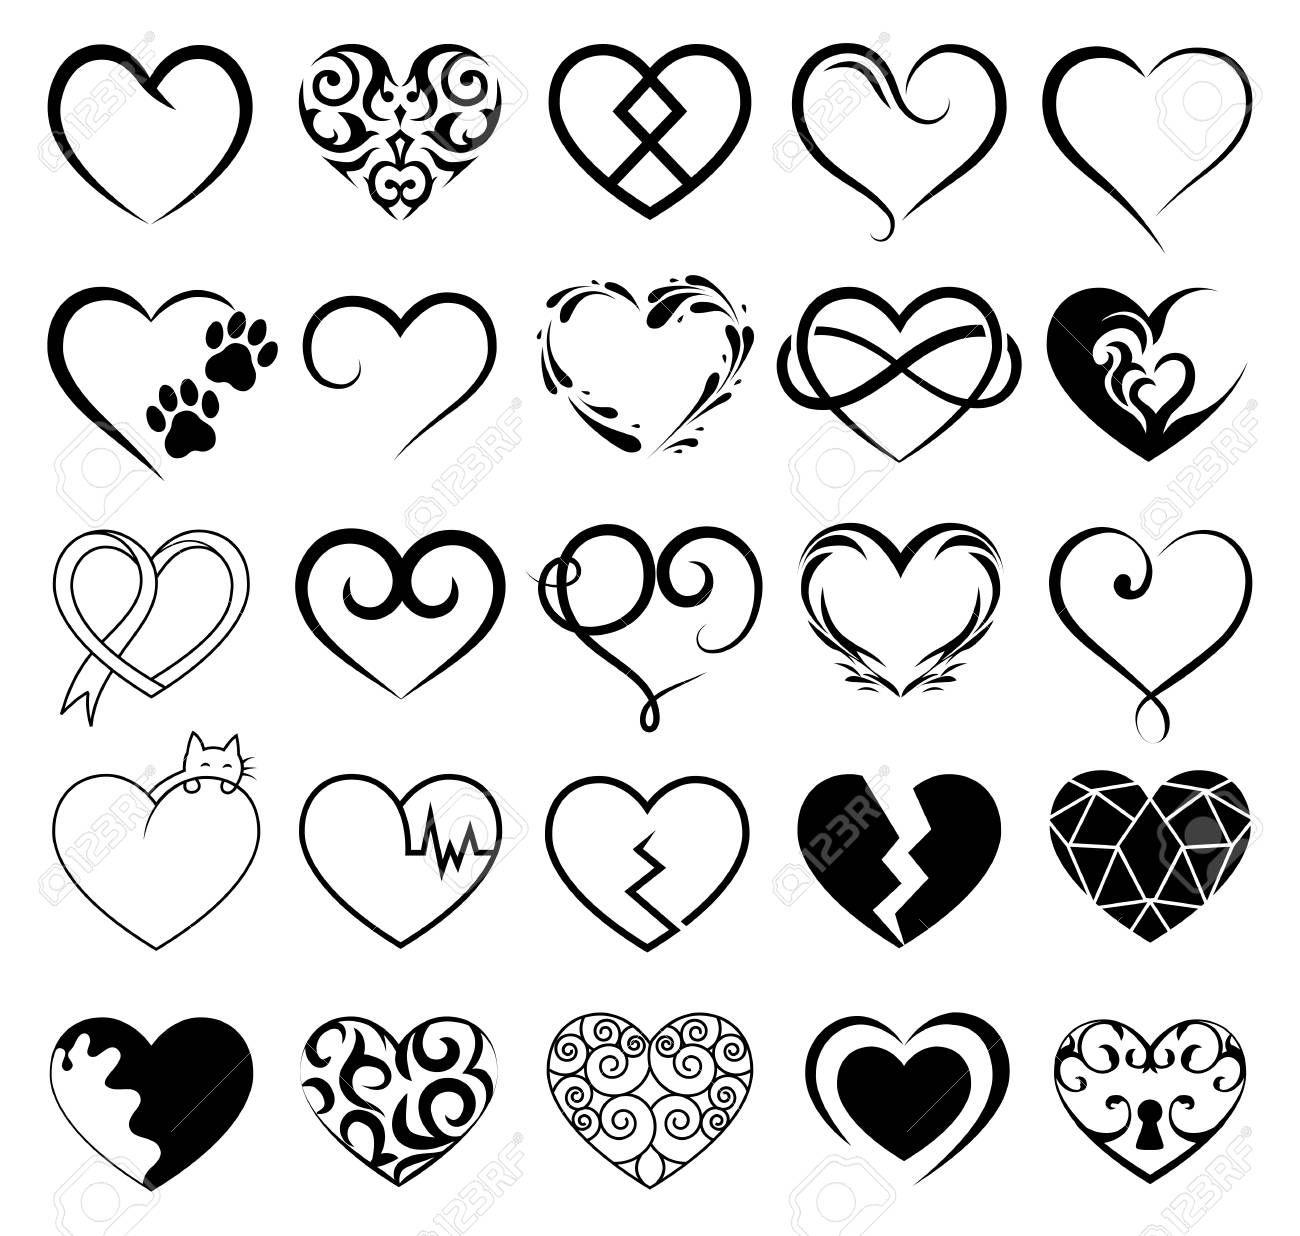 Conjunto De 25 Tatuajes Corazones Imagen Vector Simbolo Disenos De Tatuajes De Corazon Tatuaje Corazon Tatuajes Corazones Pequenos